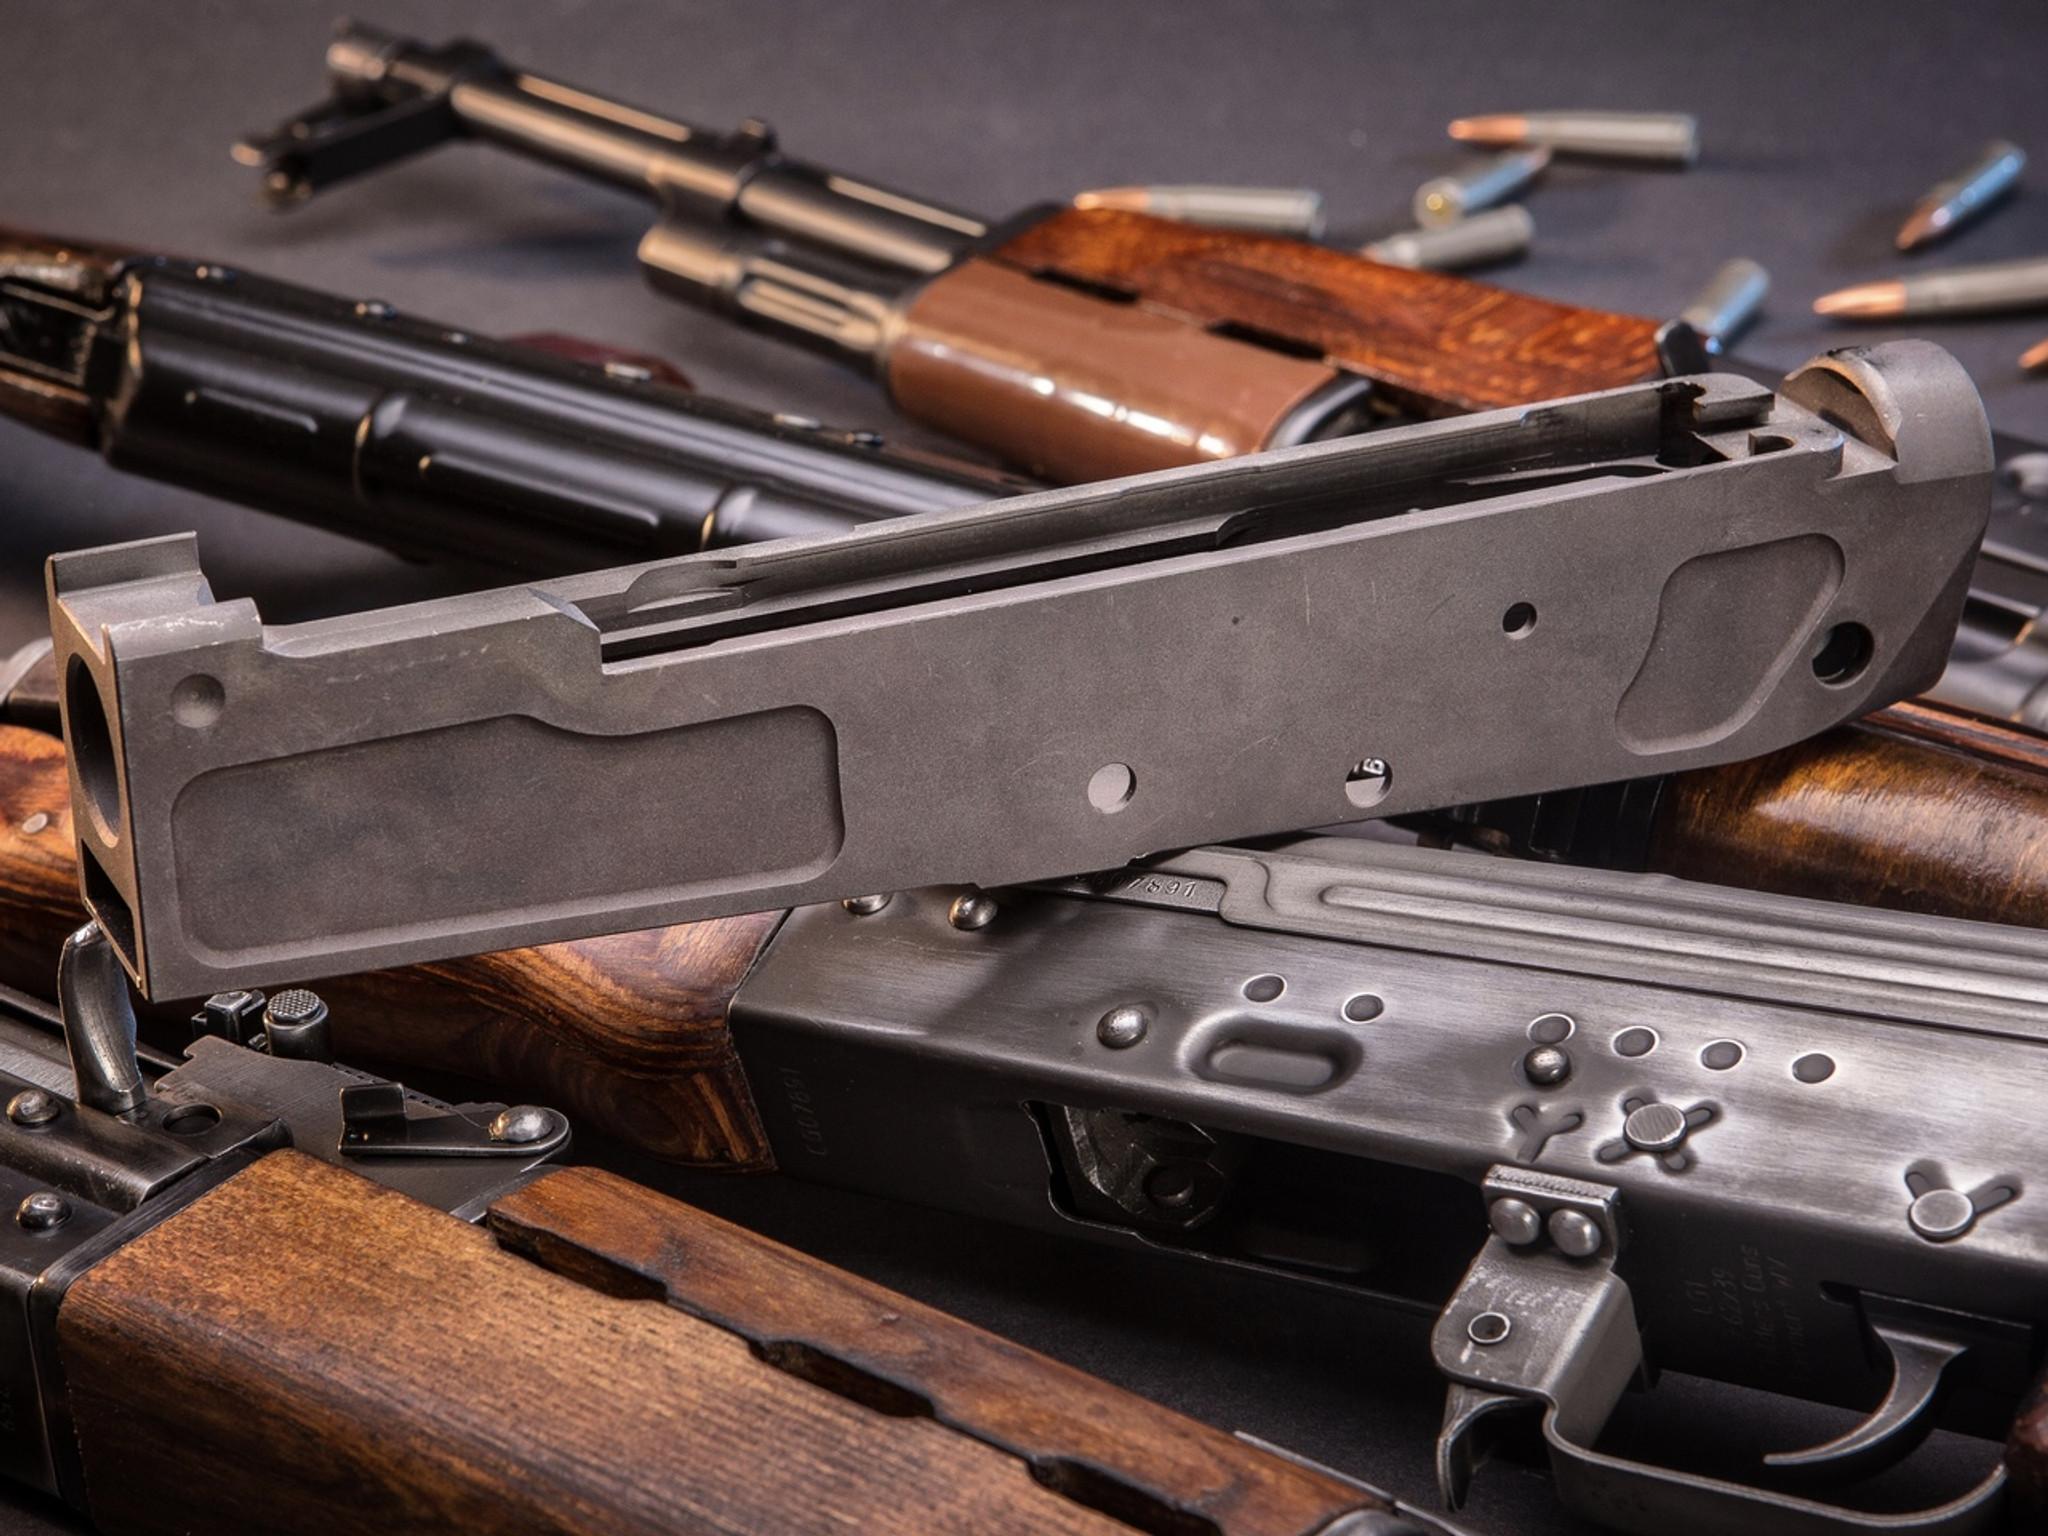 MB47 (7 62 x 39mm)